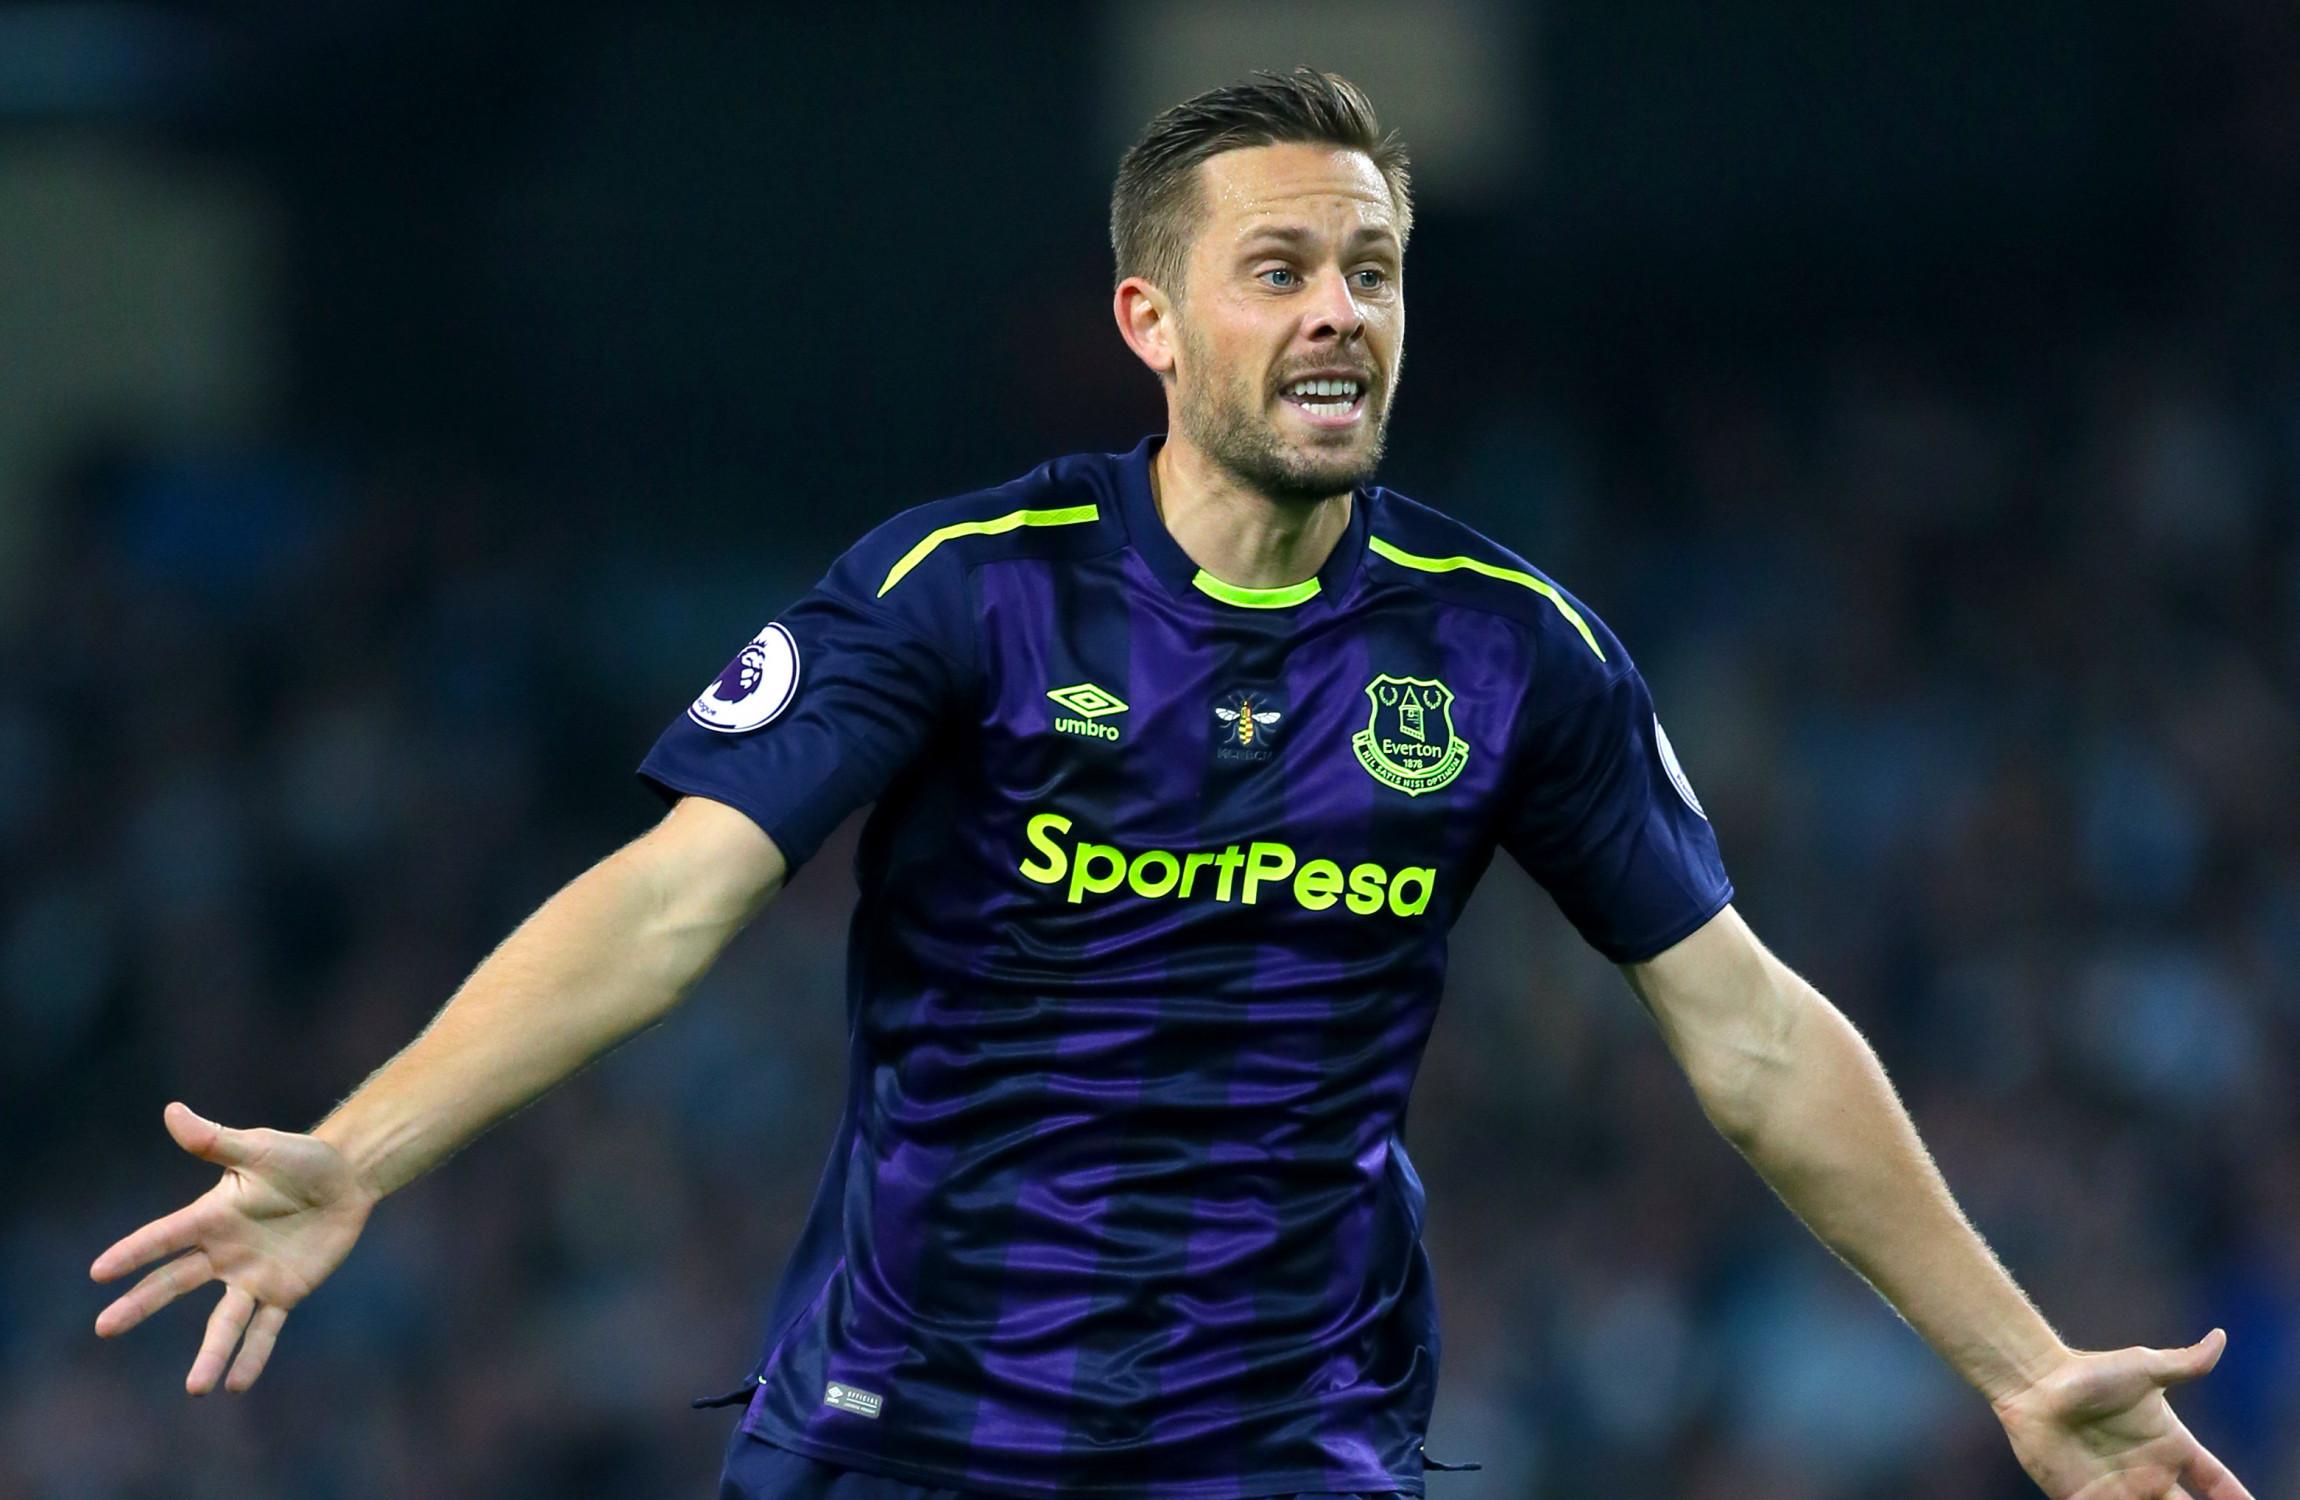 Gylfi Sigurdsson scores astonishing 50 yard volley as Everton